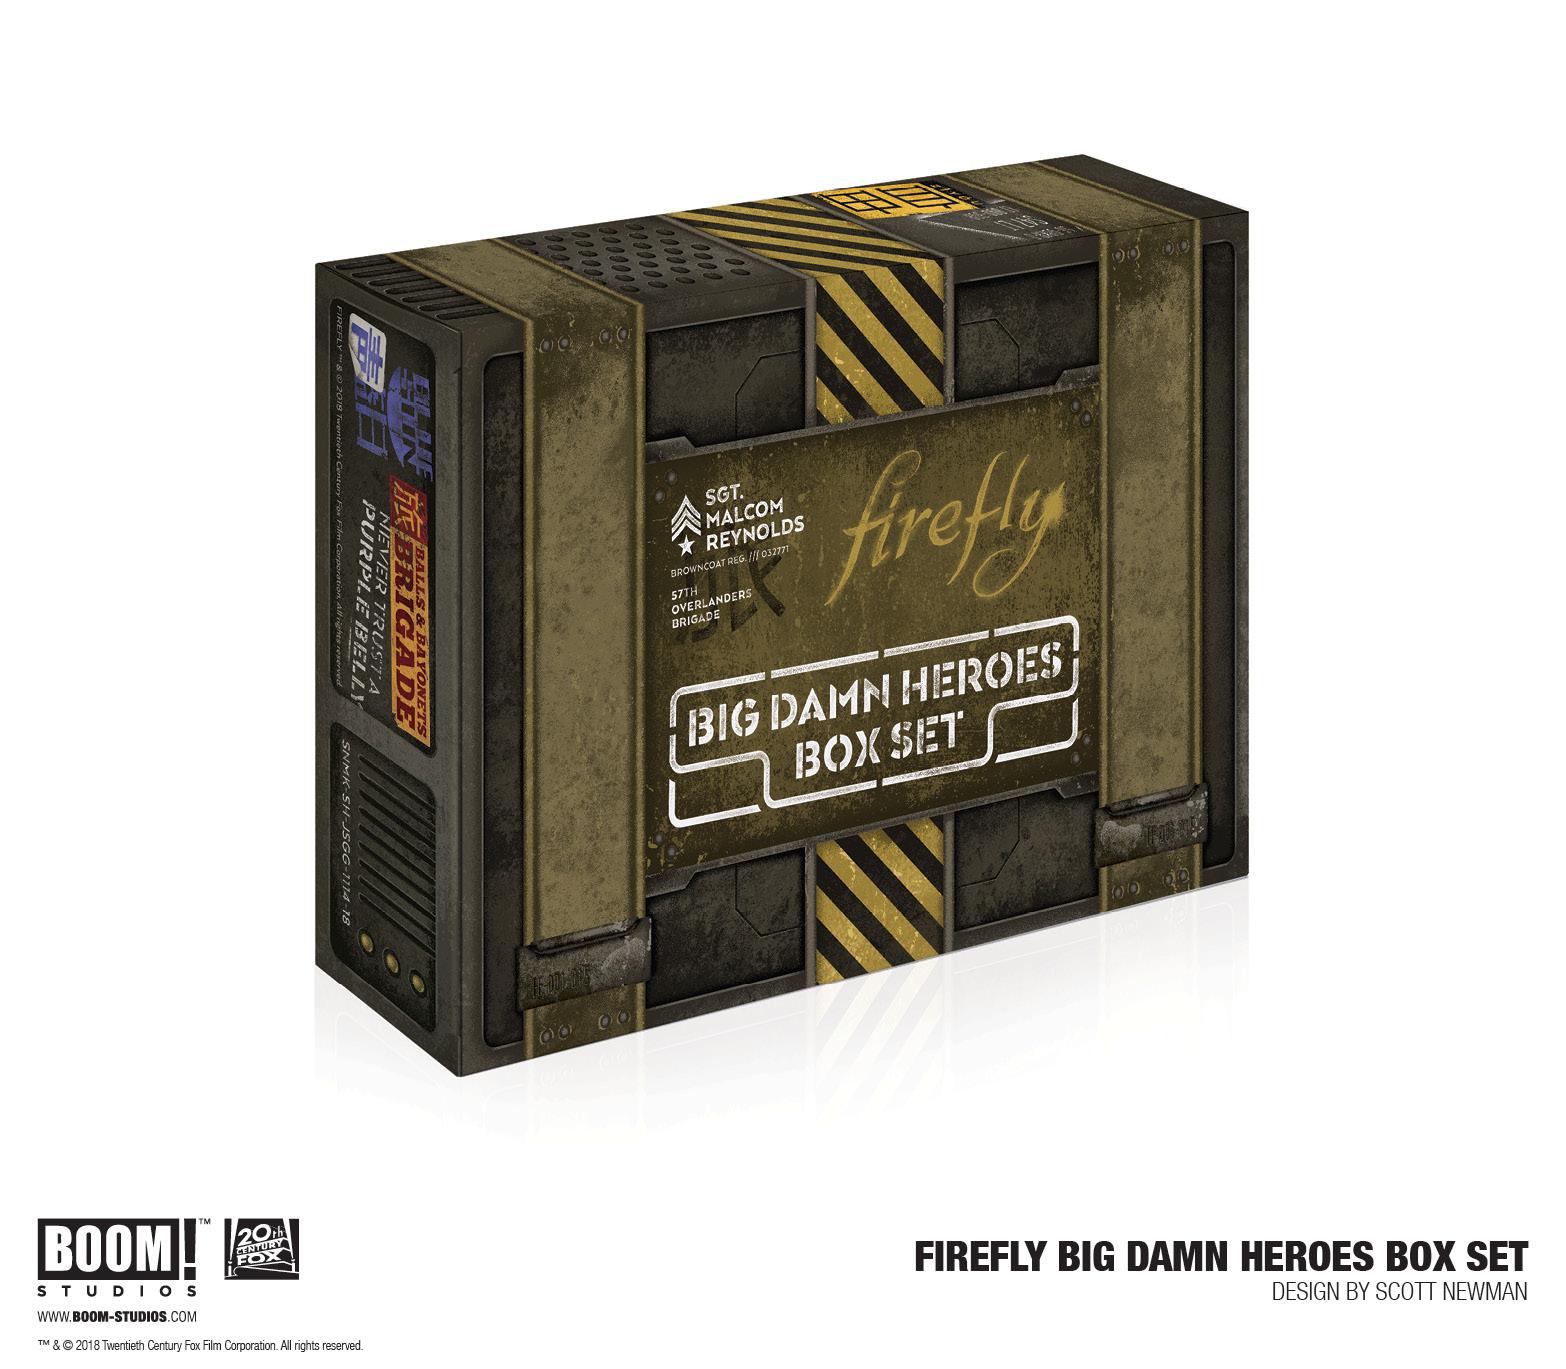 Firefly - Big Damn Heroes Box Set